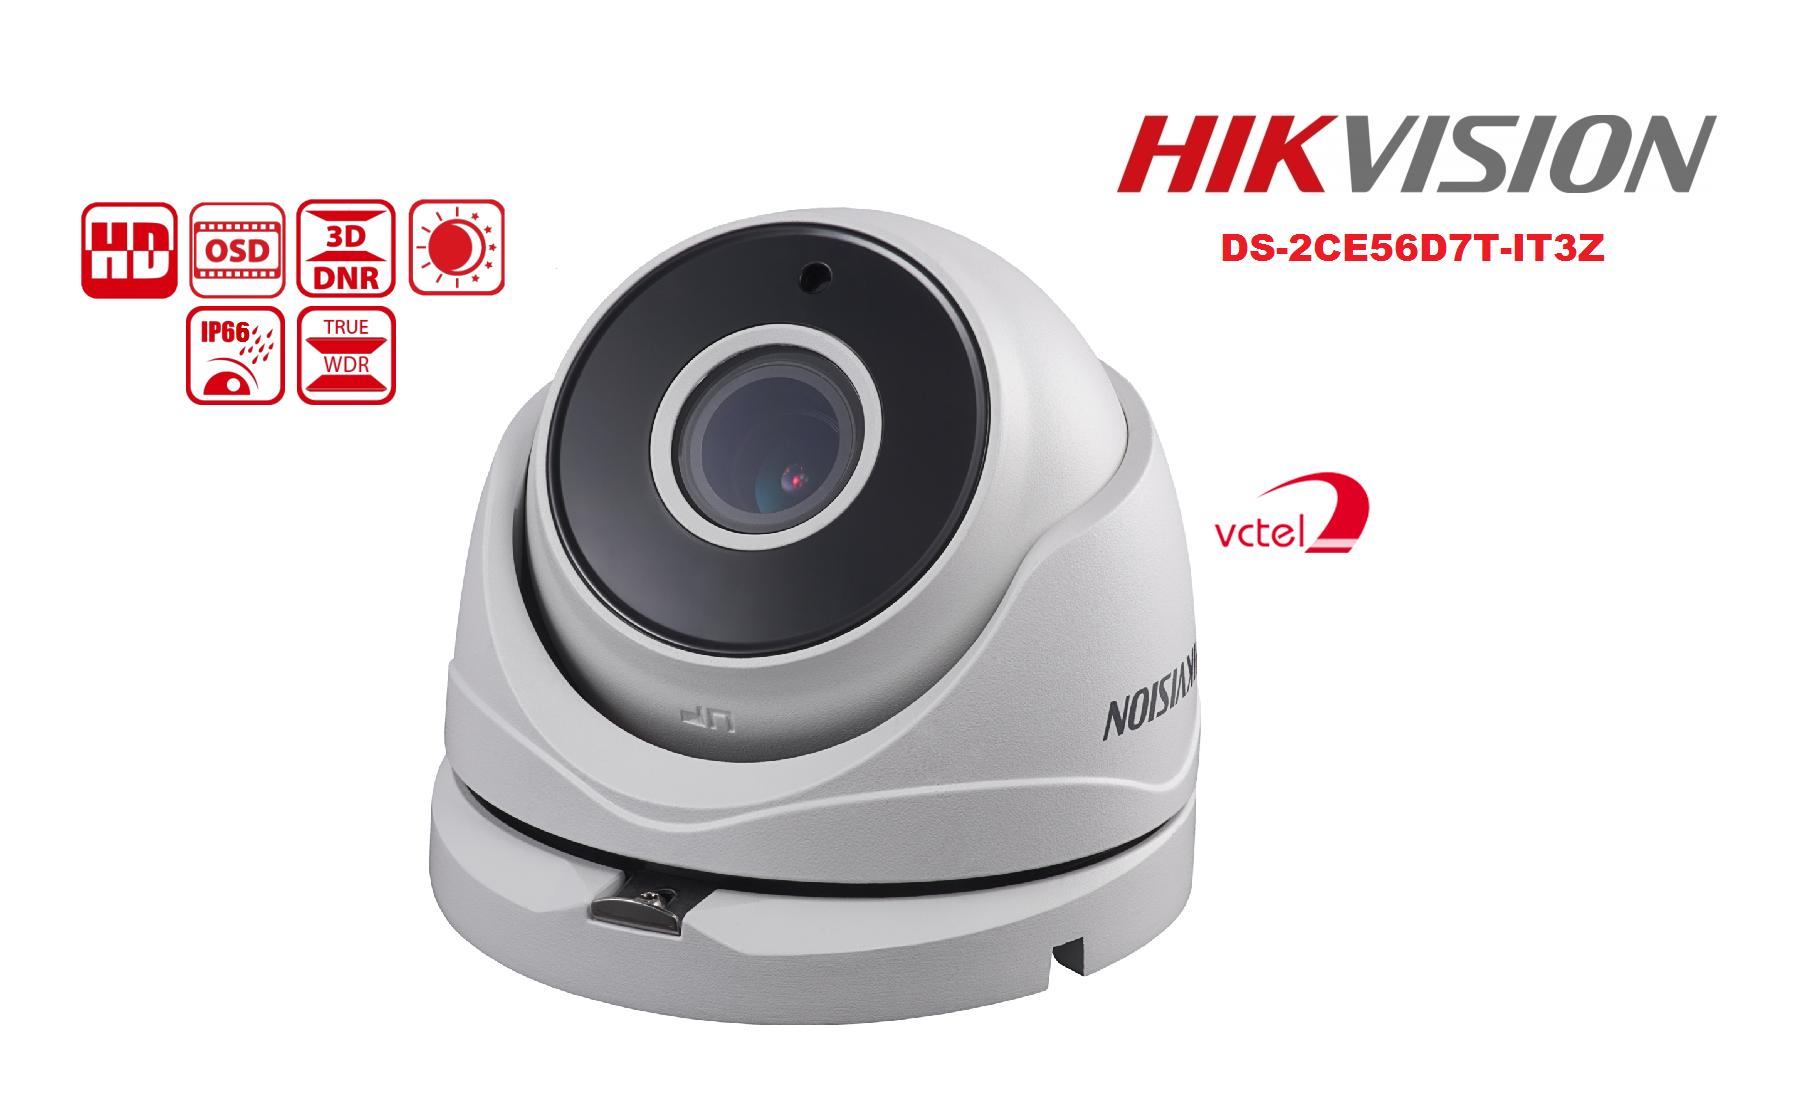 Camera Hikvision DS-2CE56D7T-IT3Z hình ảnh HD siêu nét vctel